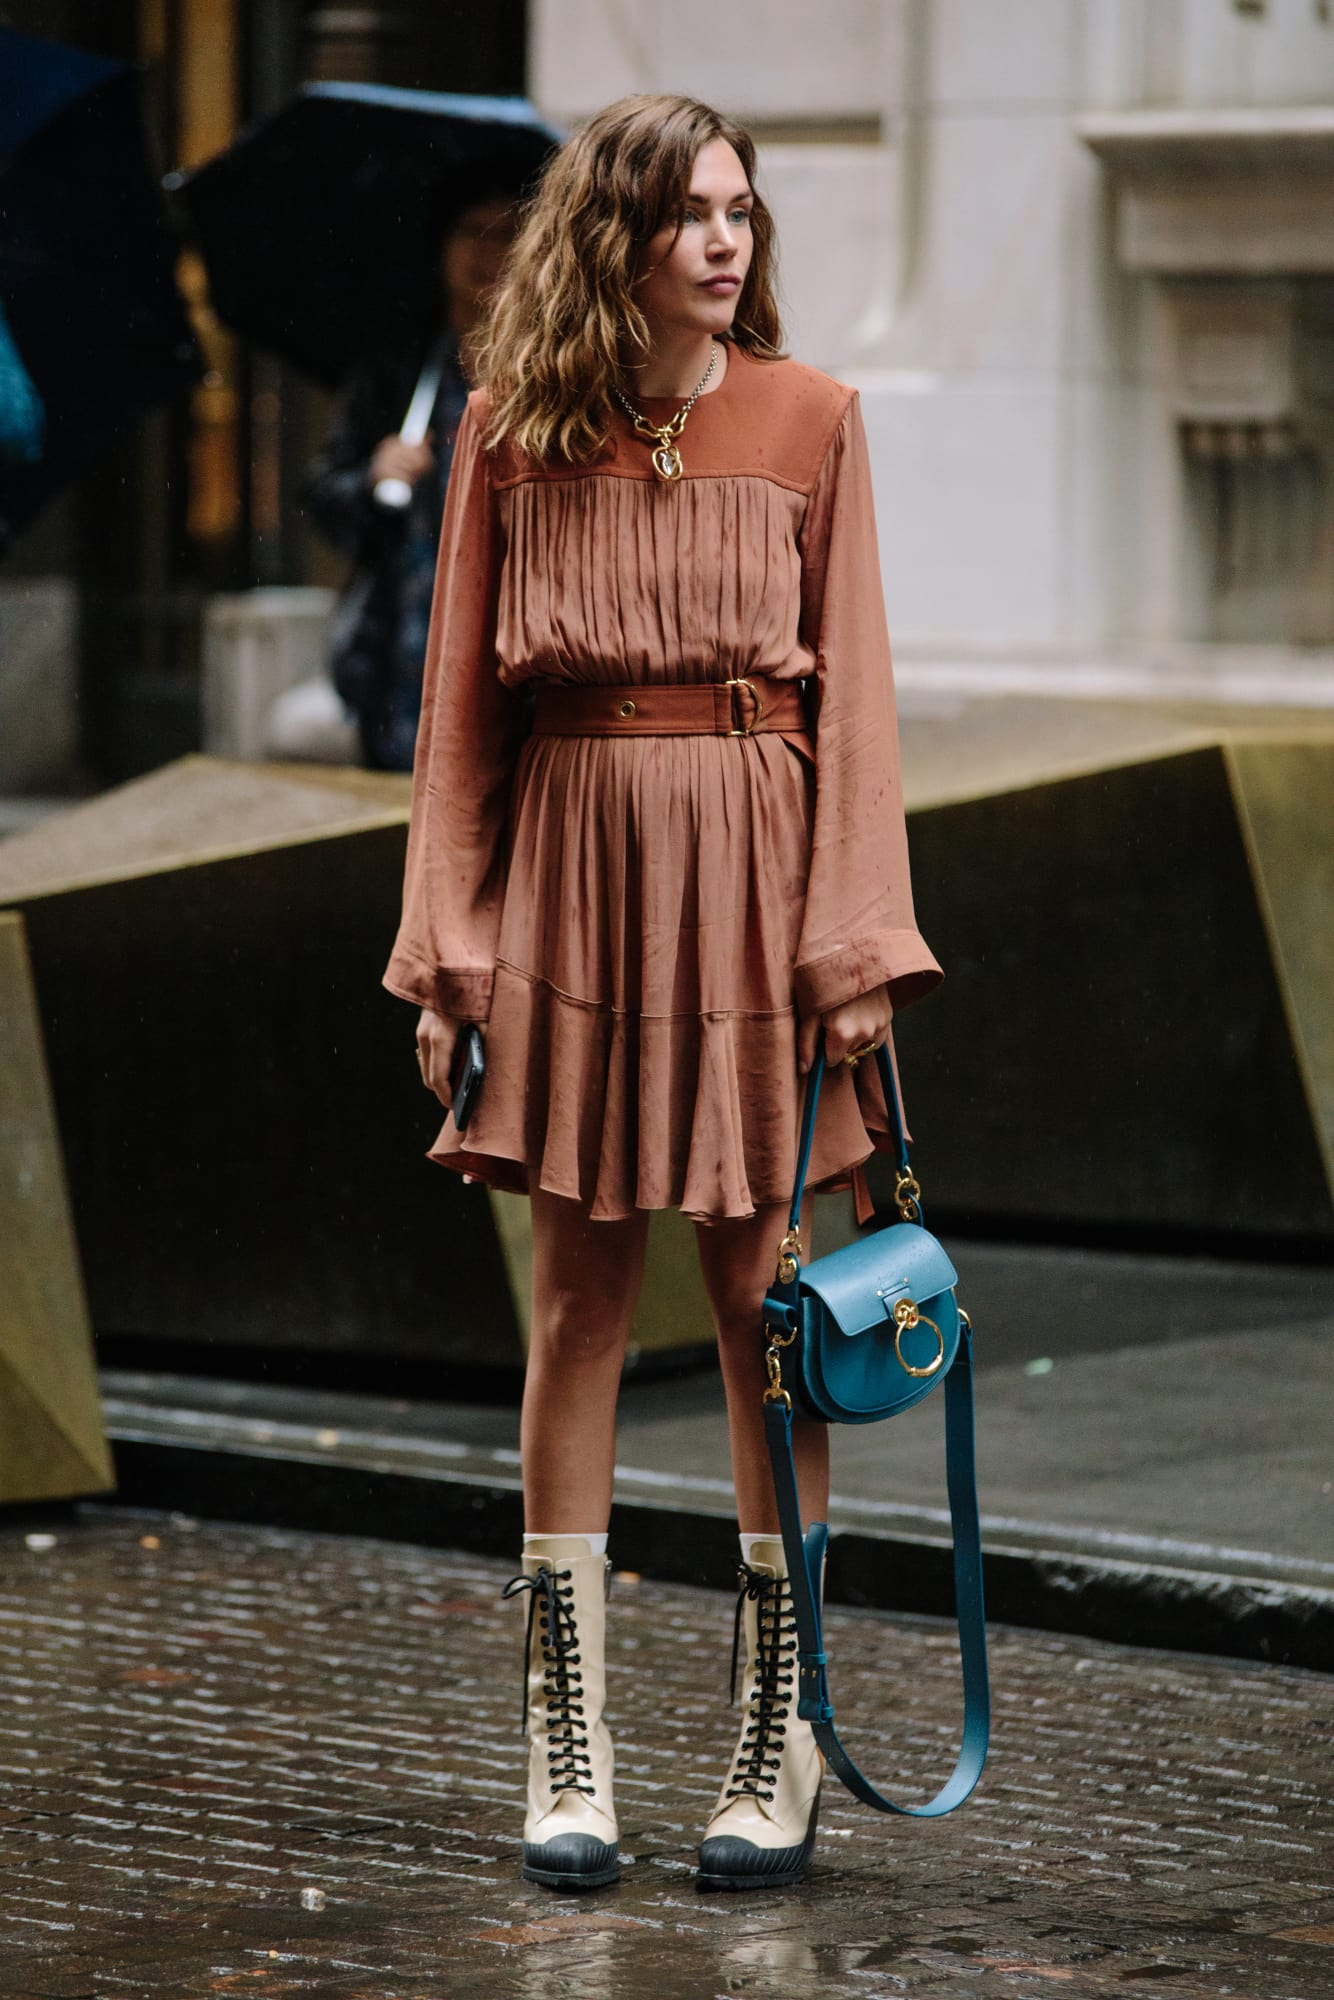 new-york-fashion-week-street-style-spring-2019-day-4-17.jpg